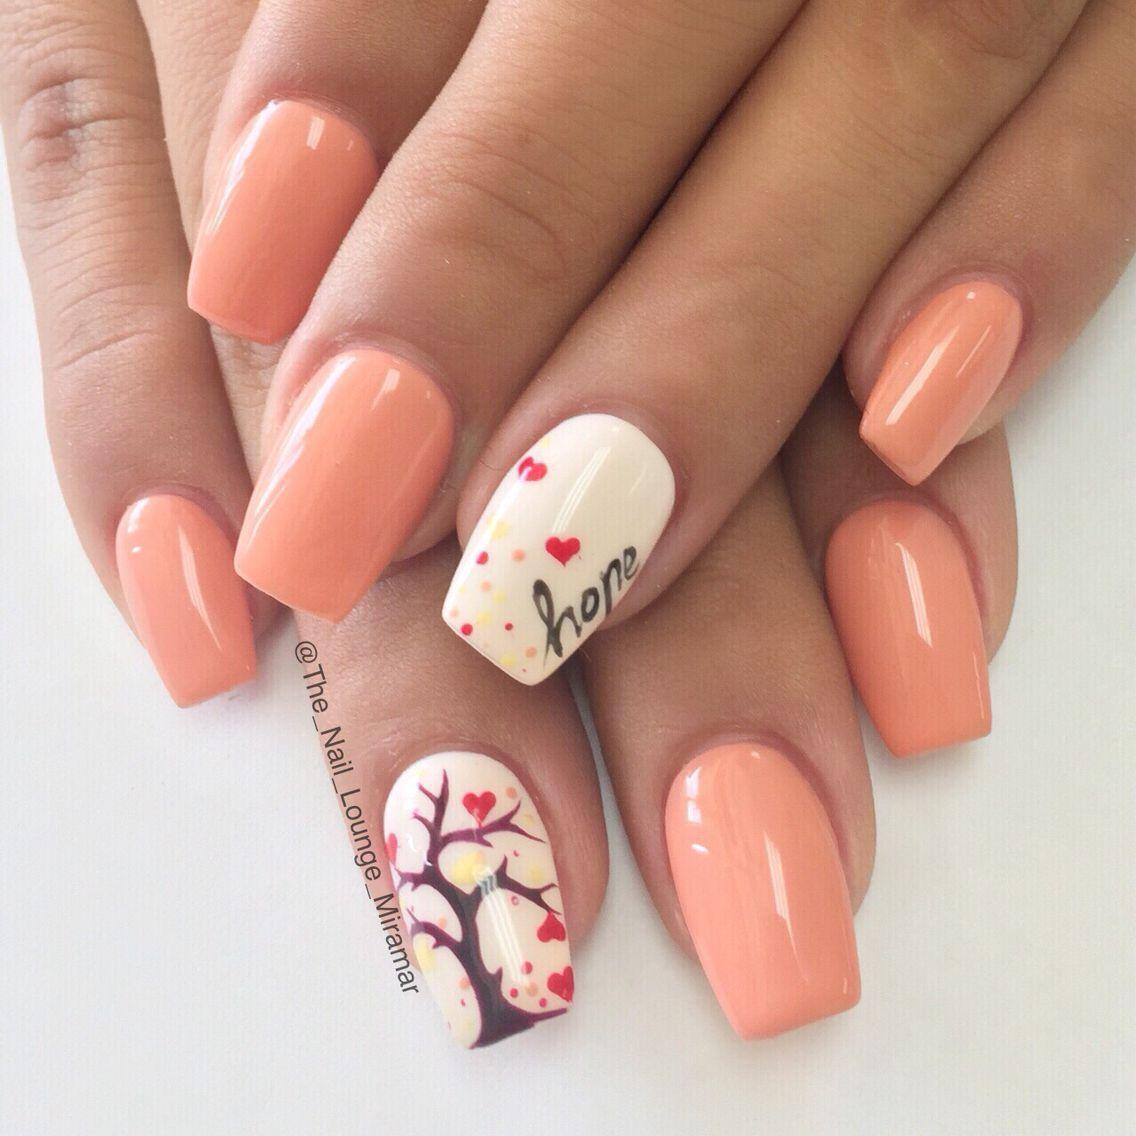 Hope fall heart tree nail art design | Acrylic Nail Art Designs ...